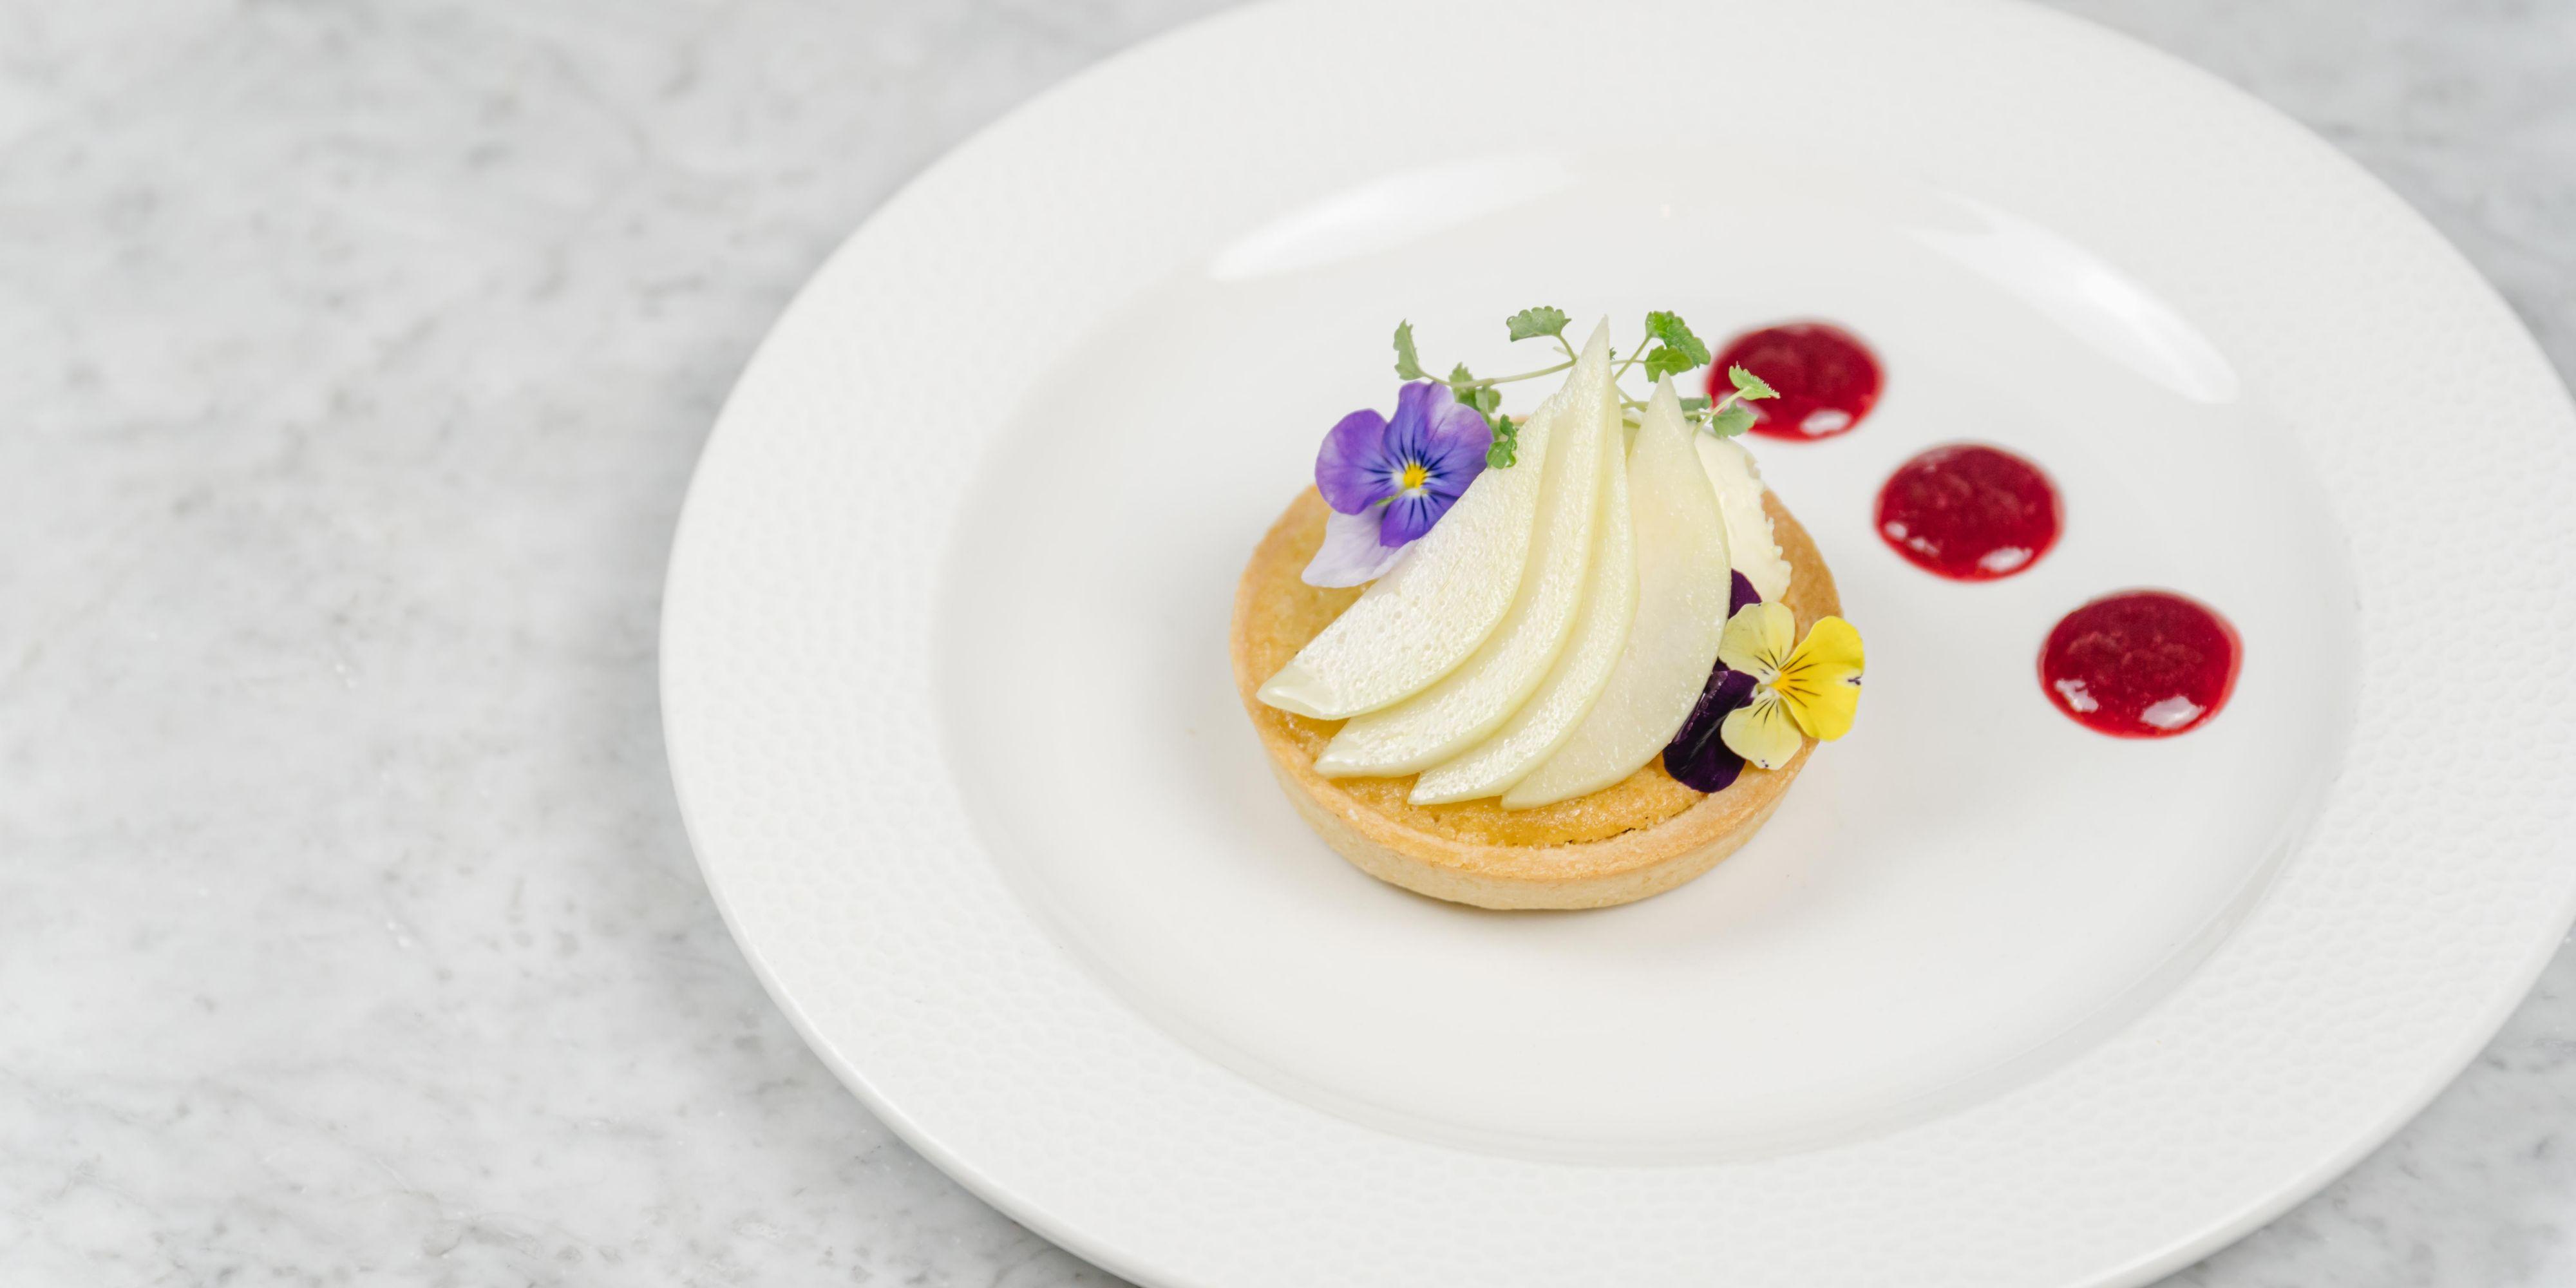 Finish with a sweet pear frangipane tart